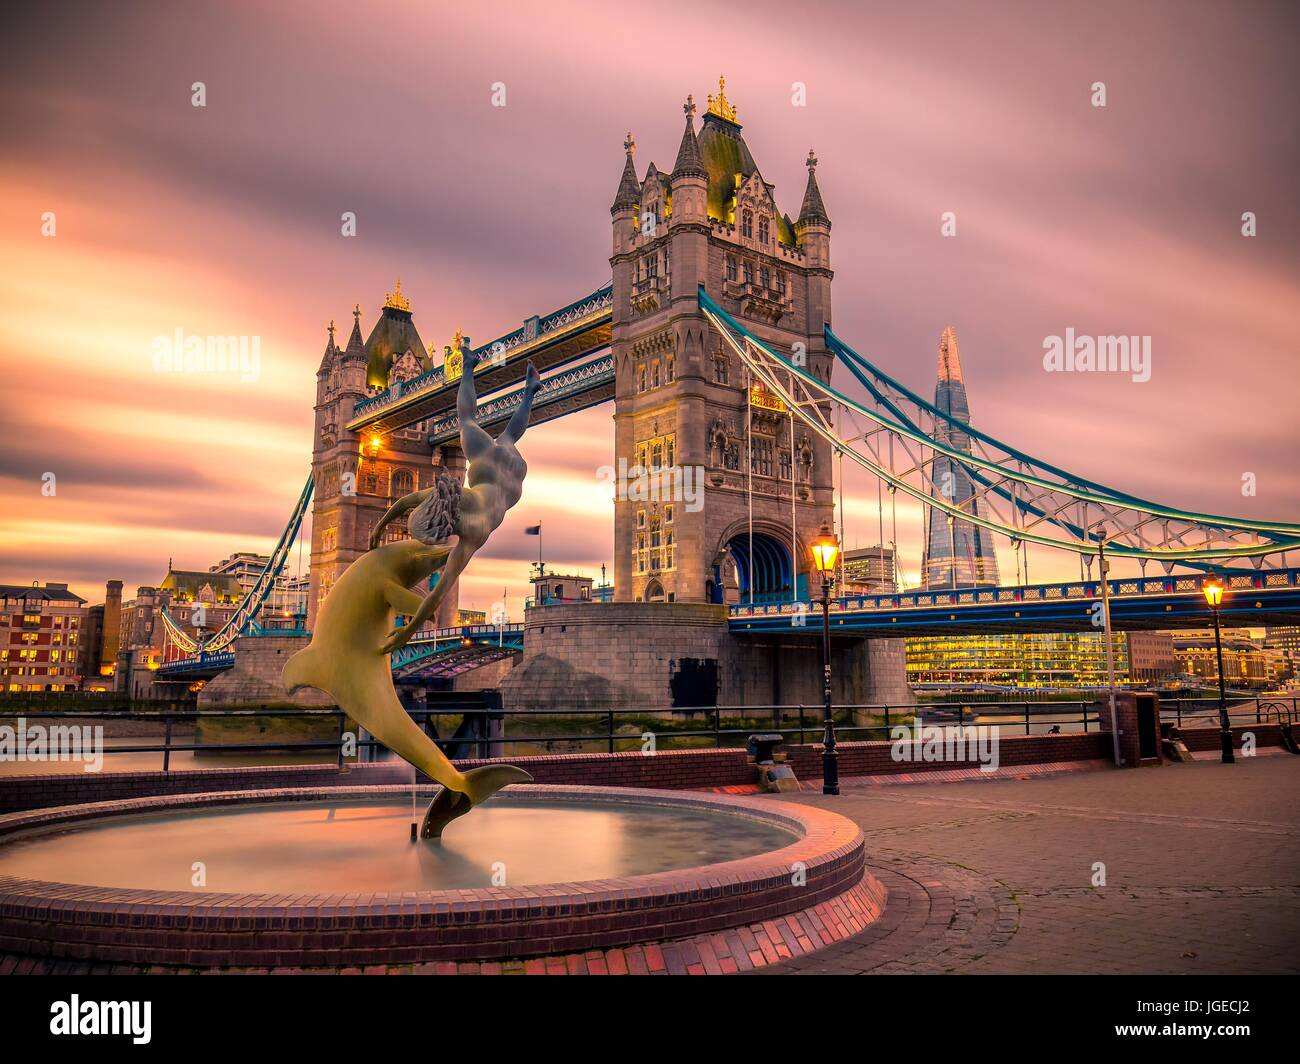 Tower bridge - Stock Image